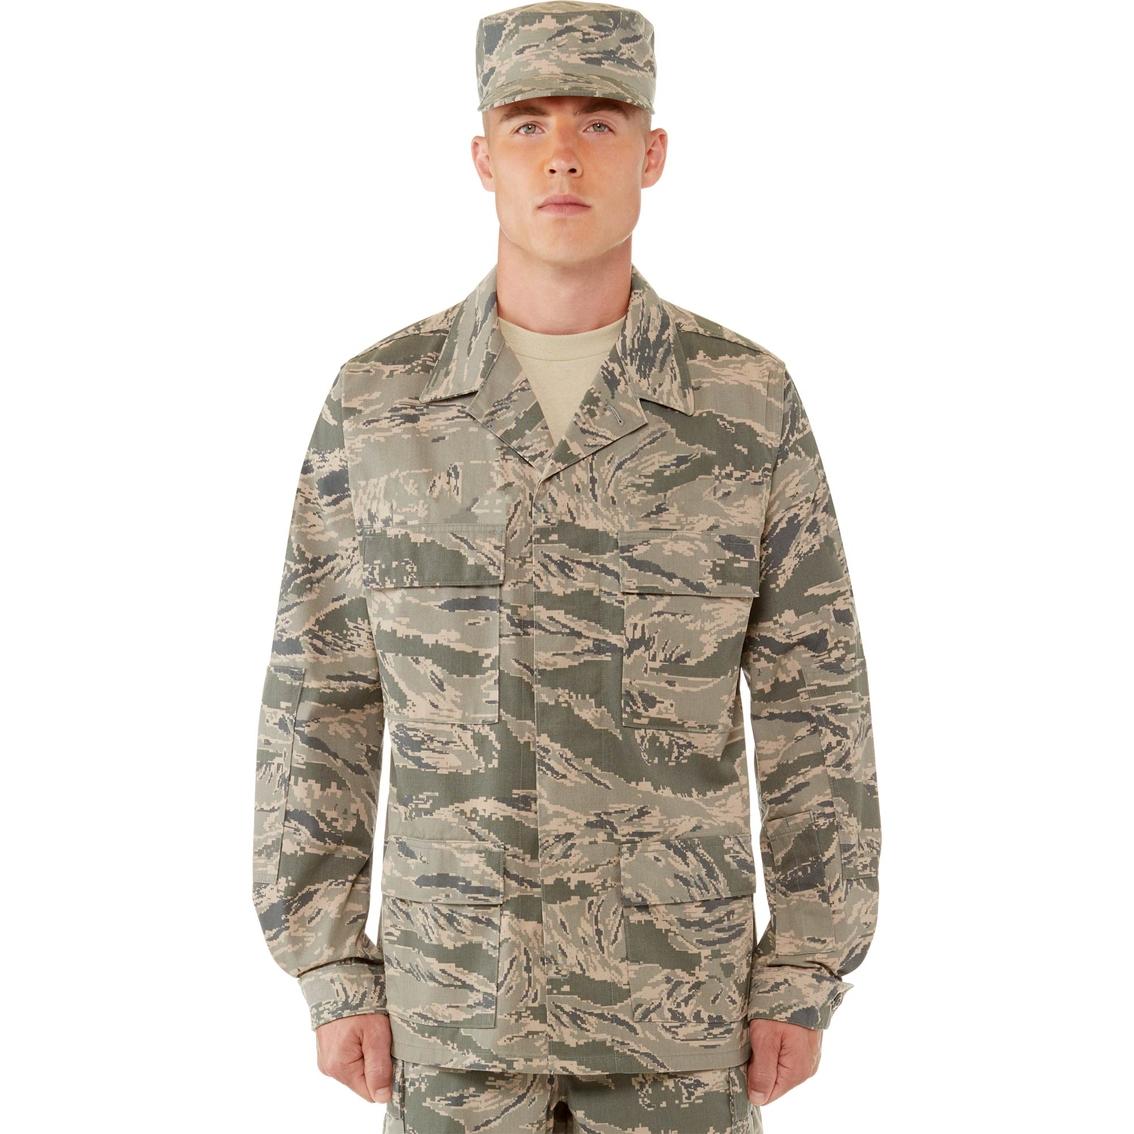 Airman Battle Uniform Wikipedia